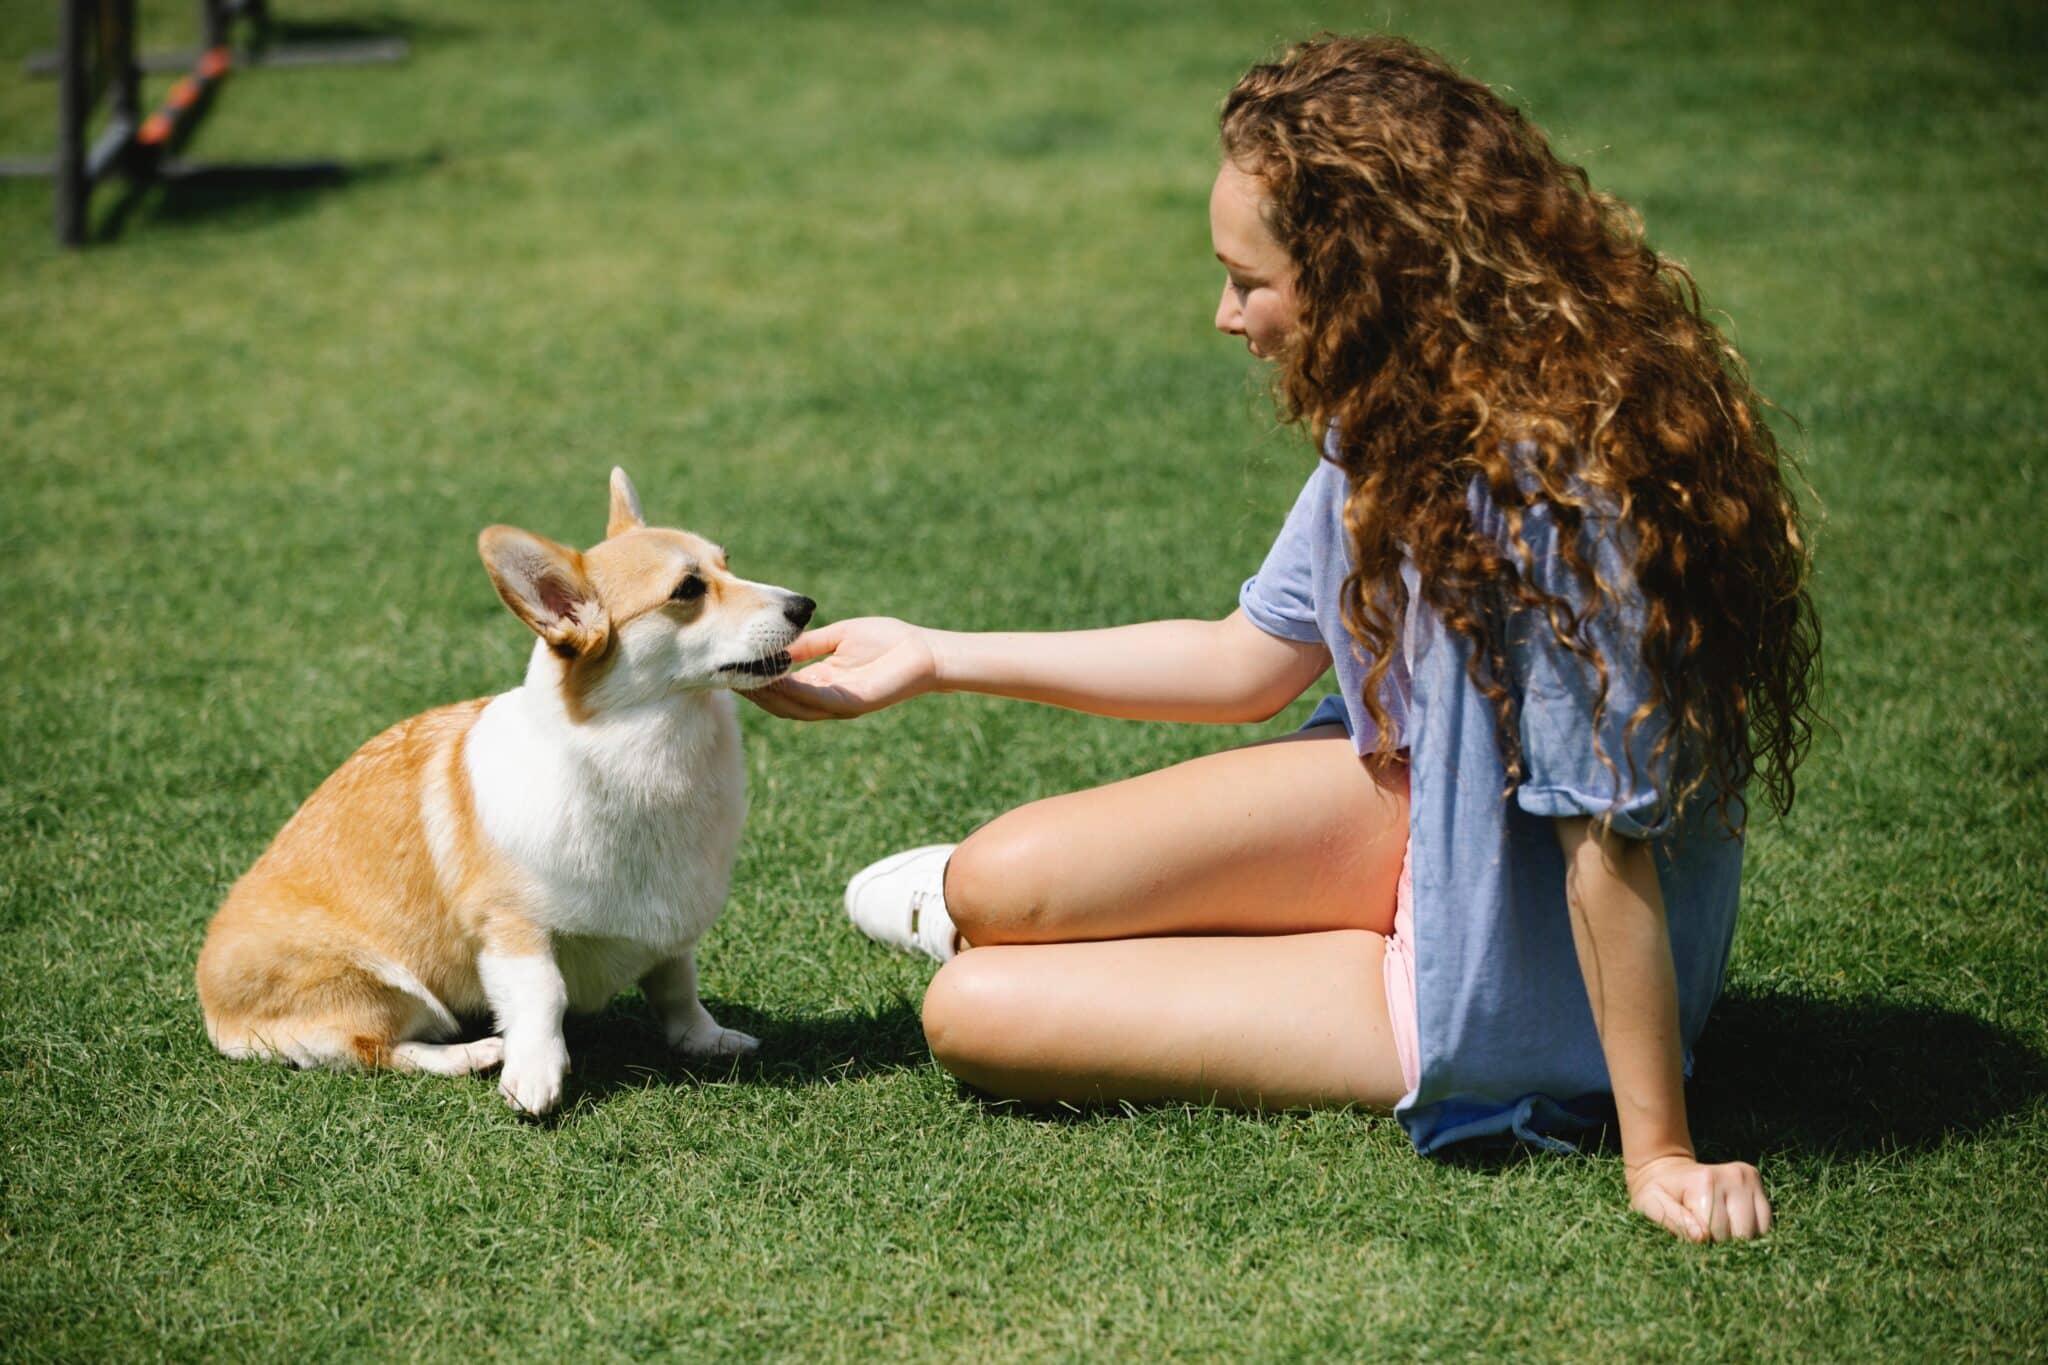 petting a young corgi dog